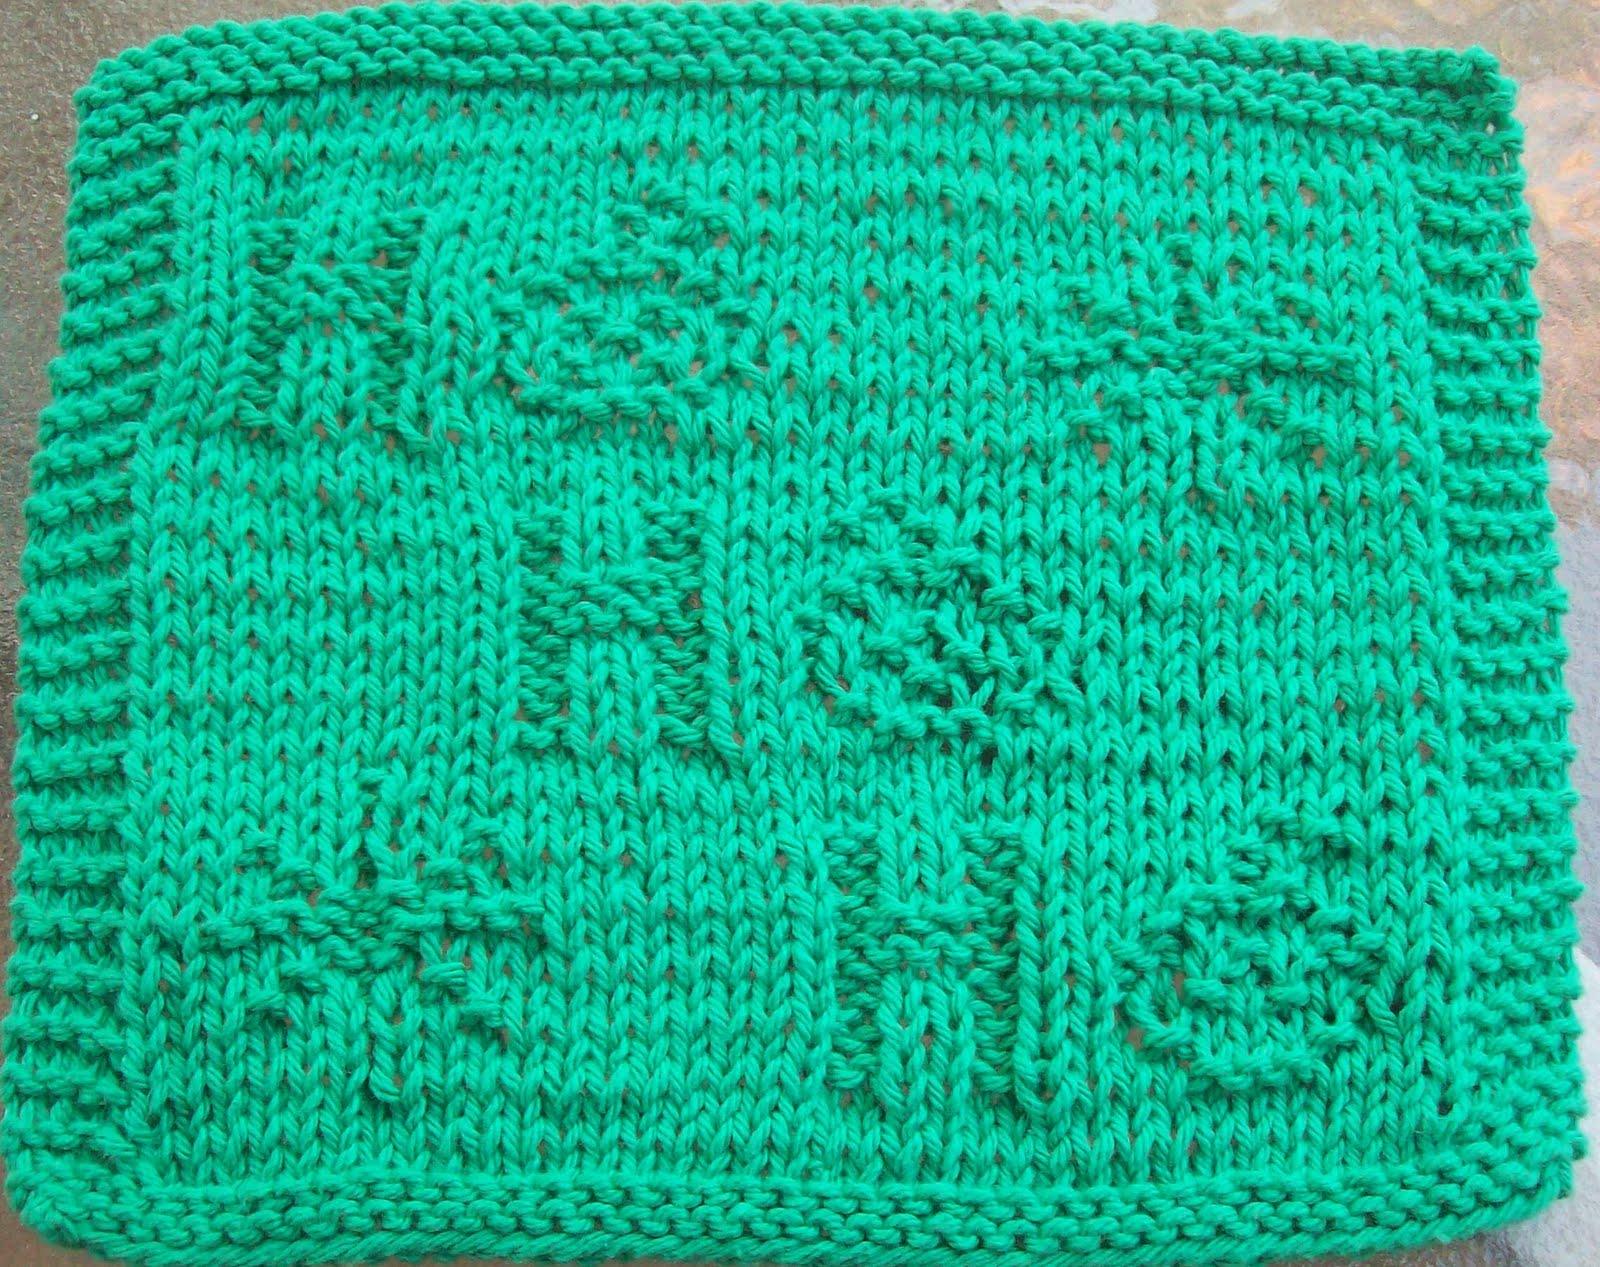 DigKnitty Designs: Ho Ho Ho Knit Dishcloth Pattern